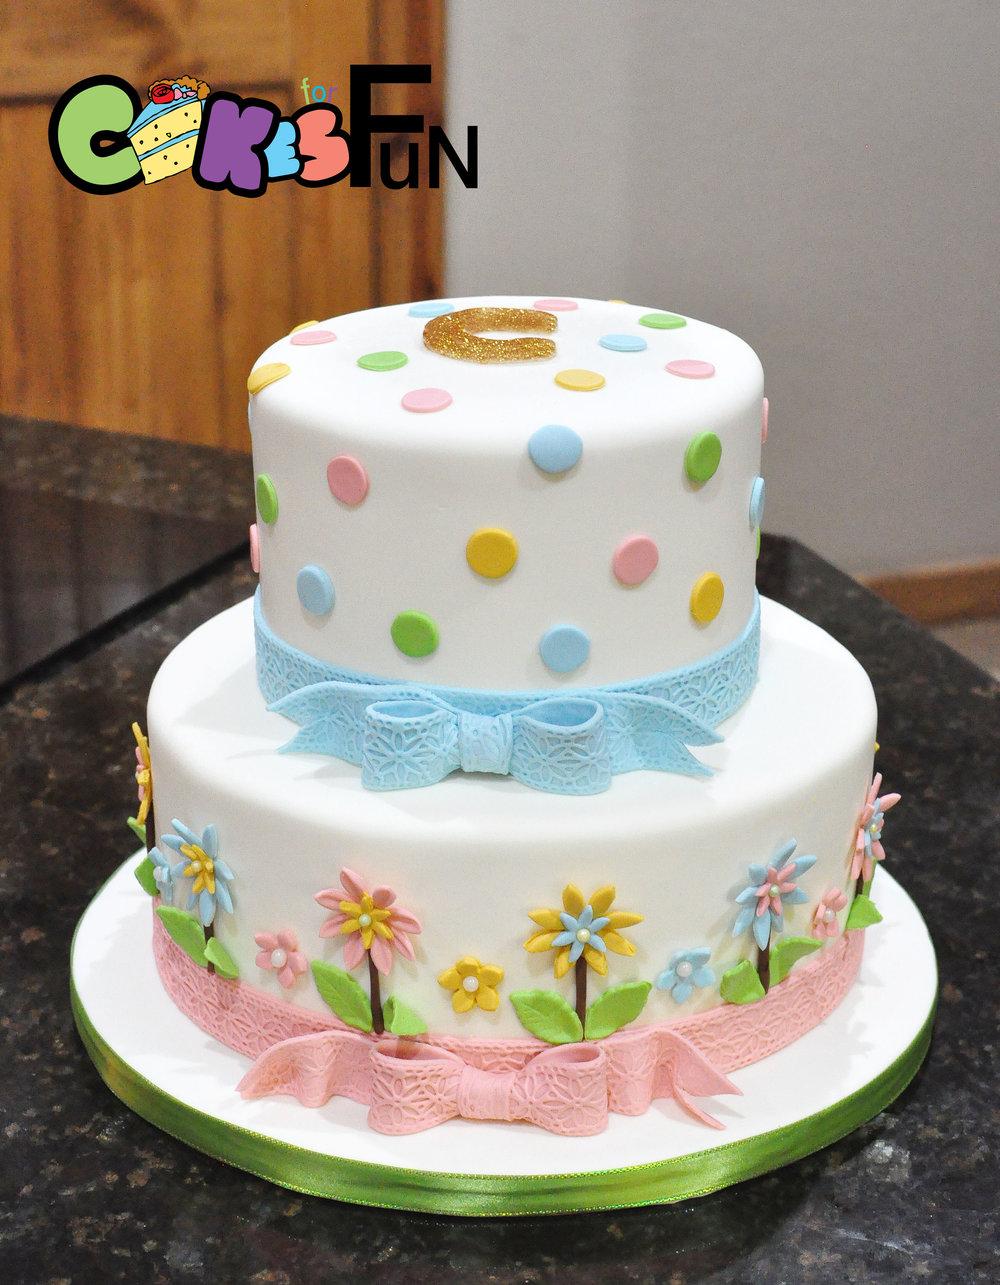 floral and polka dot-branton.jpg